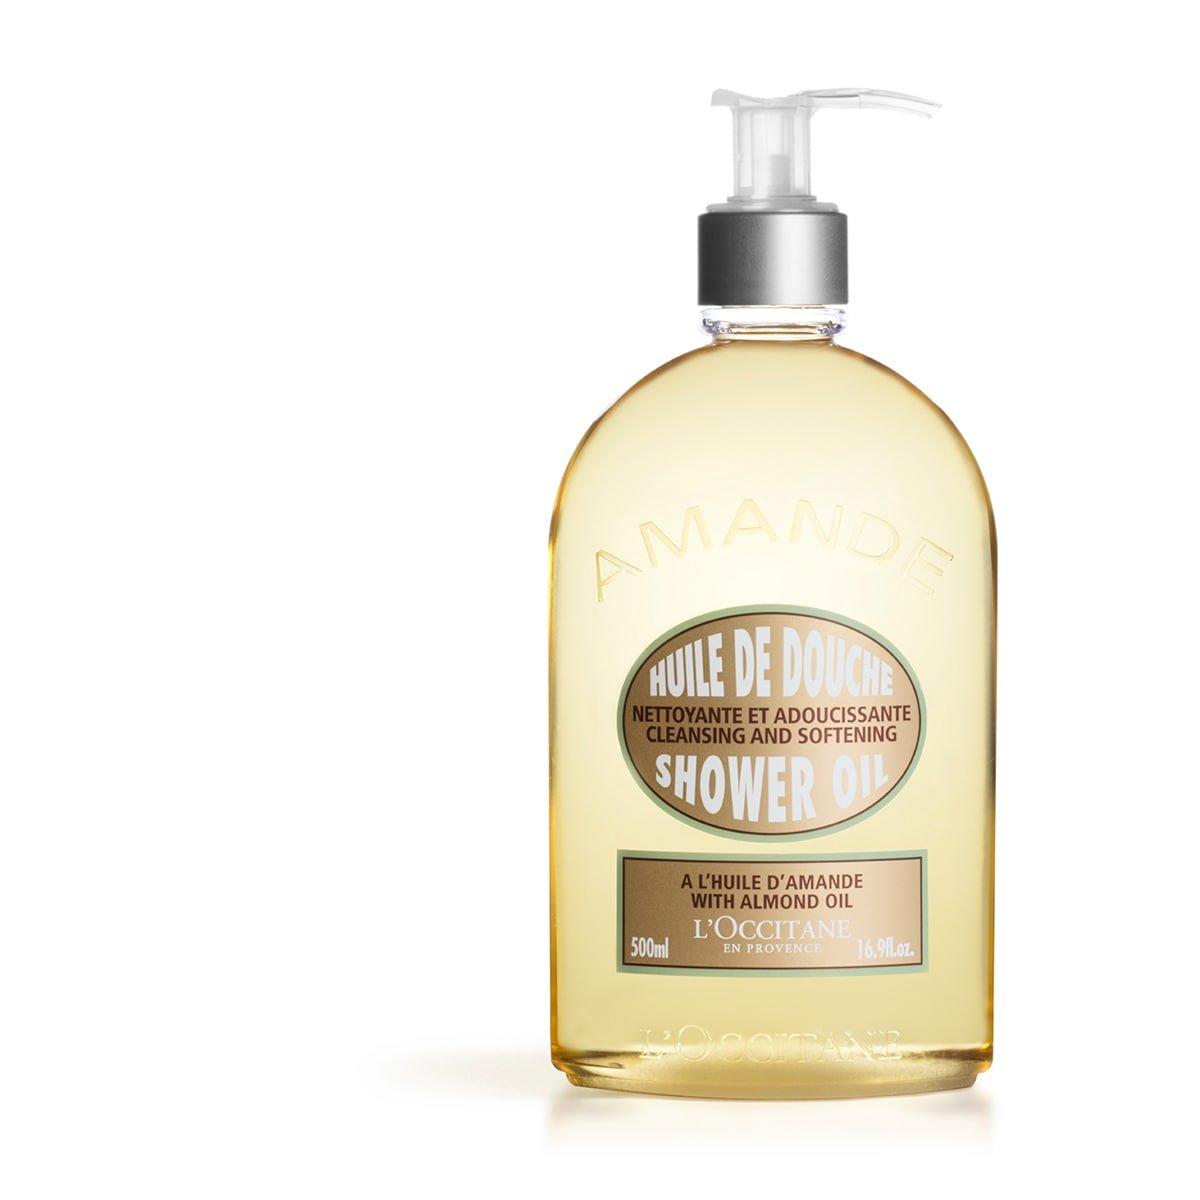 L'Occitane Cleansing & Softening Almond Shower Oil, 16.9 Fl. oz. by L'Occitane